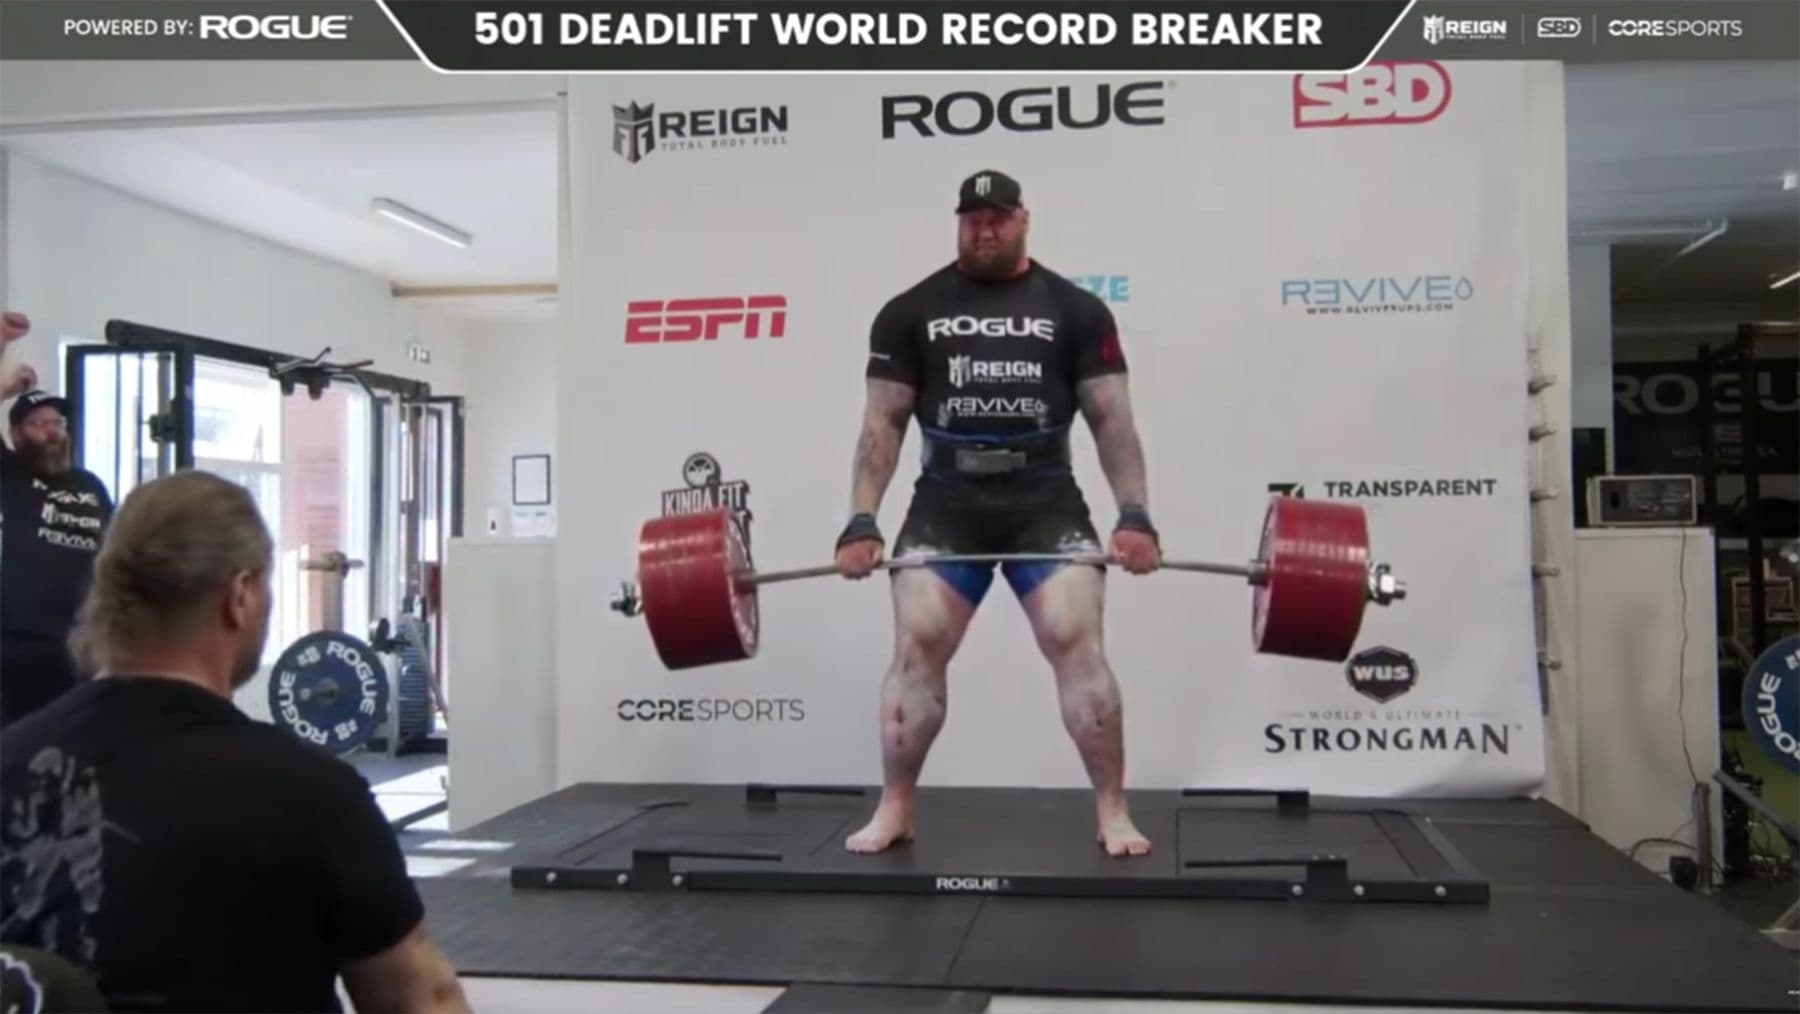 Hafþór Björnsson hebt mal eben 501 kg hoch | Awesome | Was is hier eigentlich los?